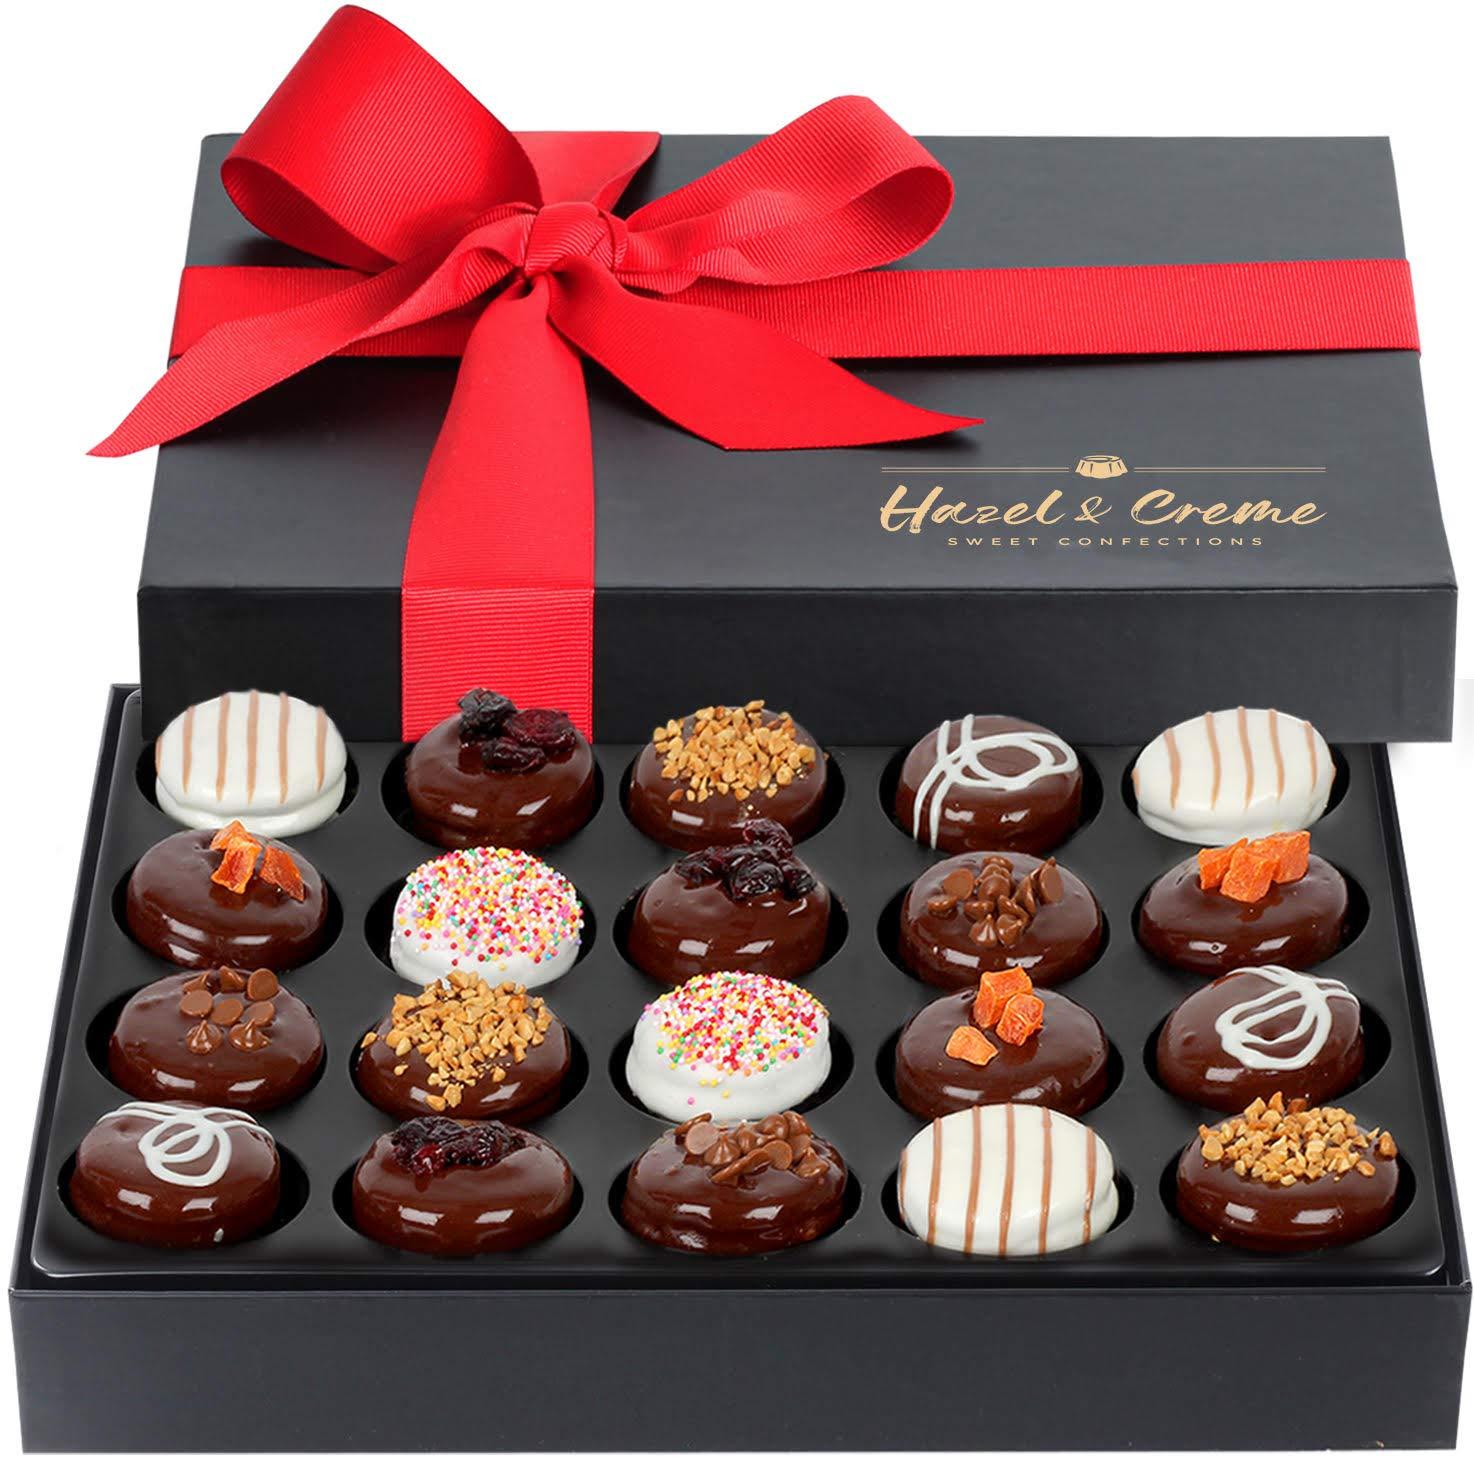 Hazel & Creme Cookies Gift Box - 20 Cookies - Gourmet Food Gift - Chocolate Cookie Gift Basket - Anniversary, Holiday, Corporate, Birthday Gift